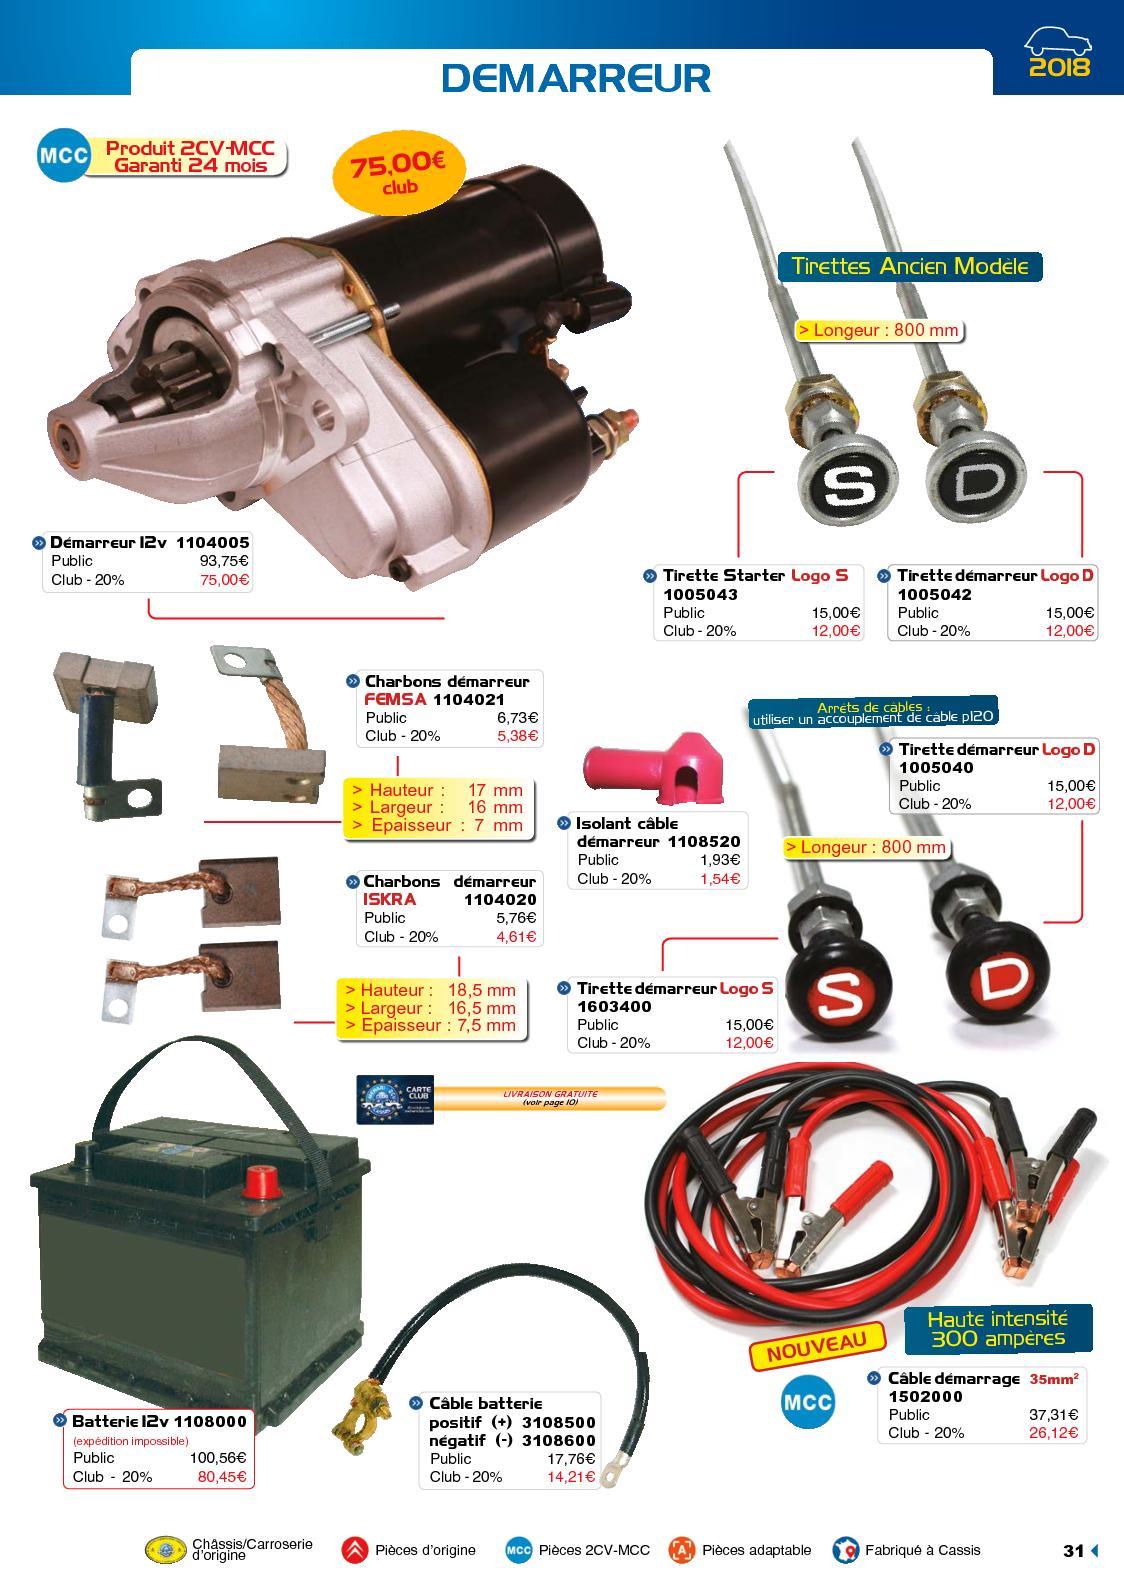 Mehari Club Cassis Catalogue 2cv 2018 Calameo Downloader Femsa Wiring Diagram Page 31